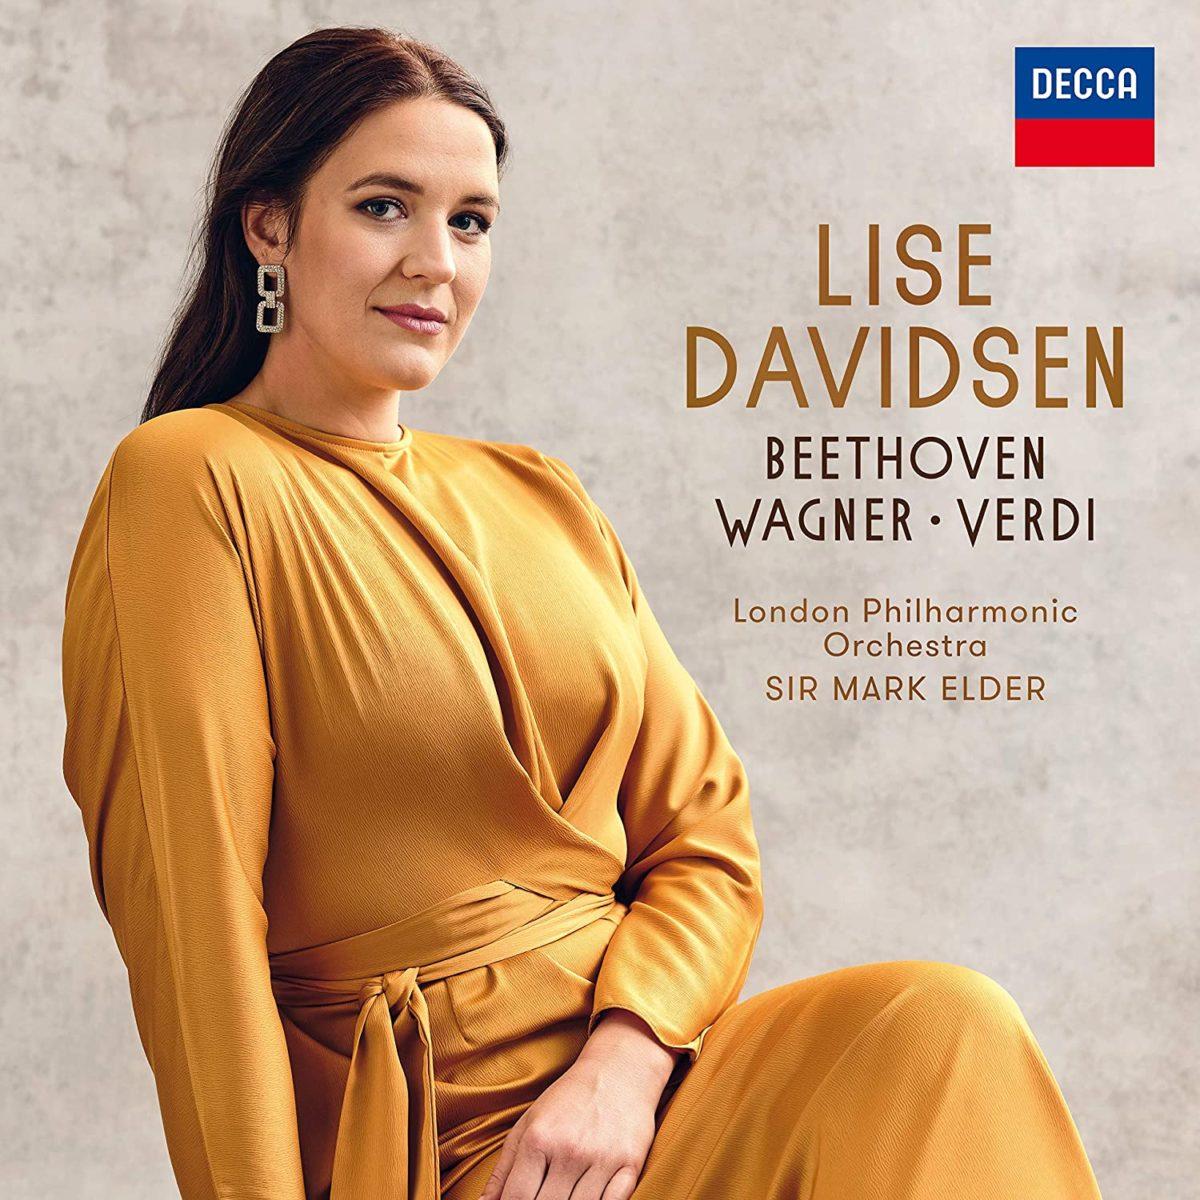 CD-Rezension: Lise Davidsen: Beethoven Wagner Verdi